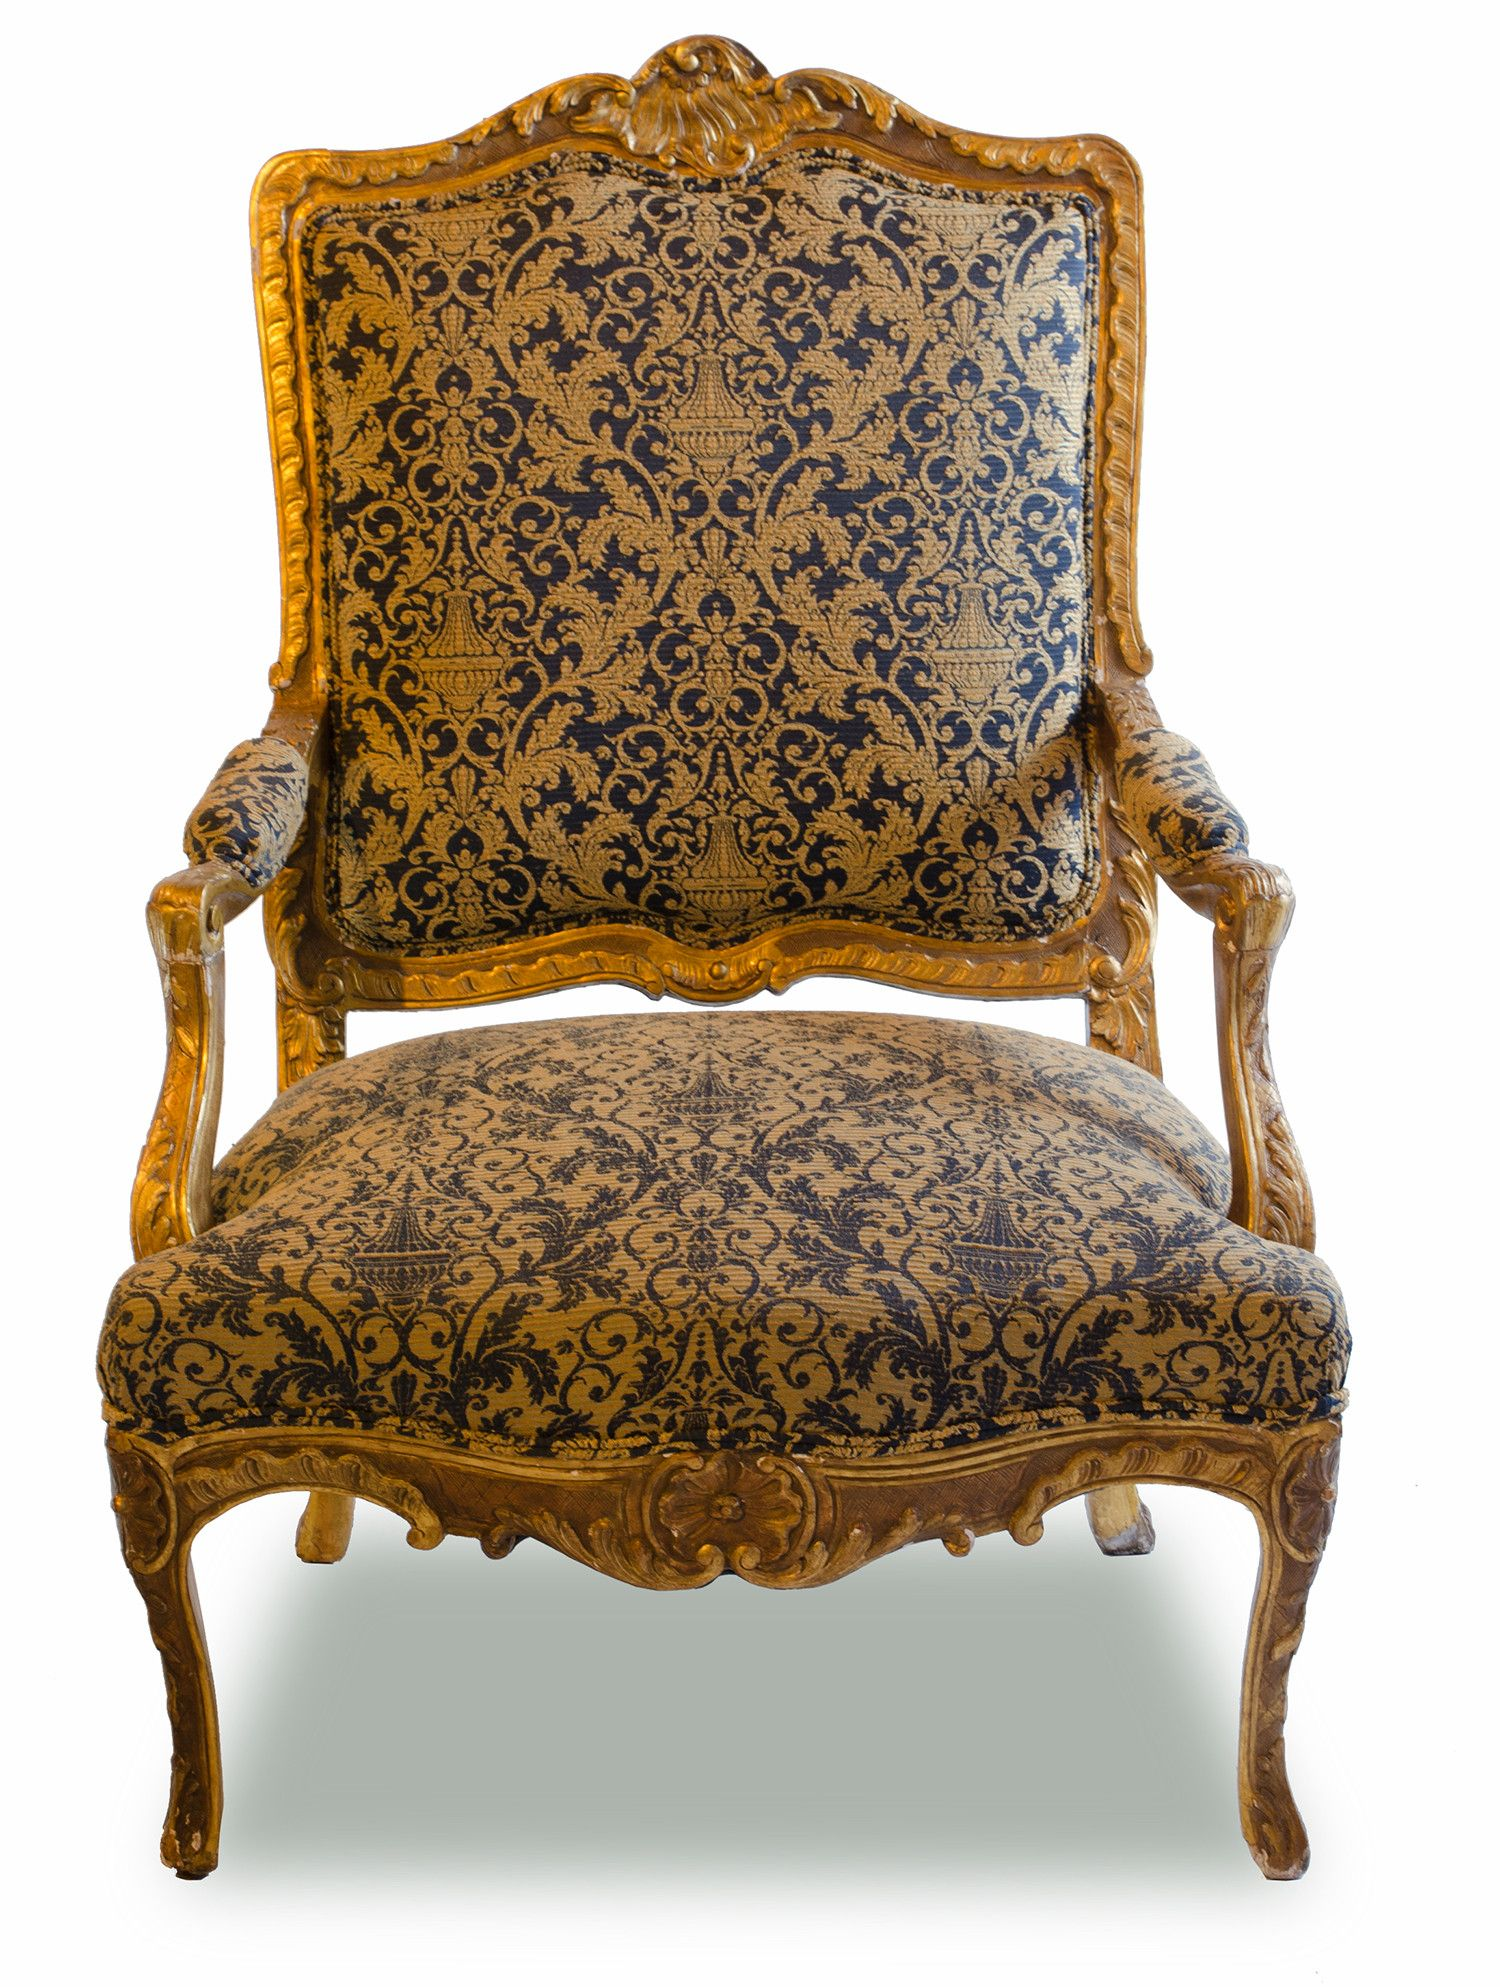 Antiques Antique Victorian Armchairs Louis Xv 1830-1860